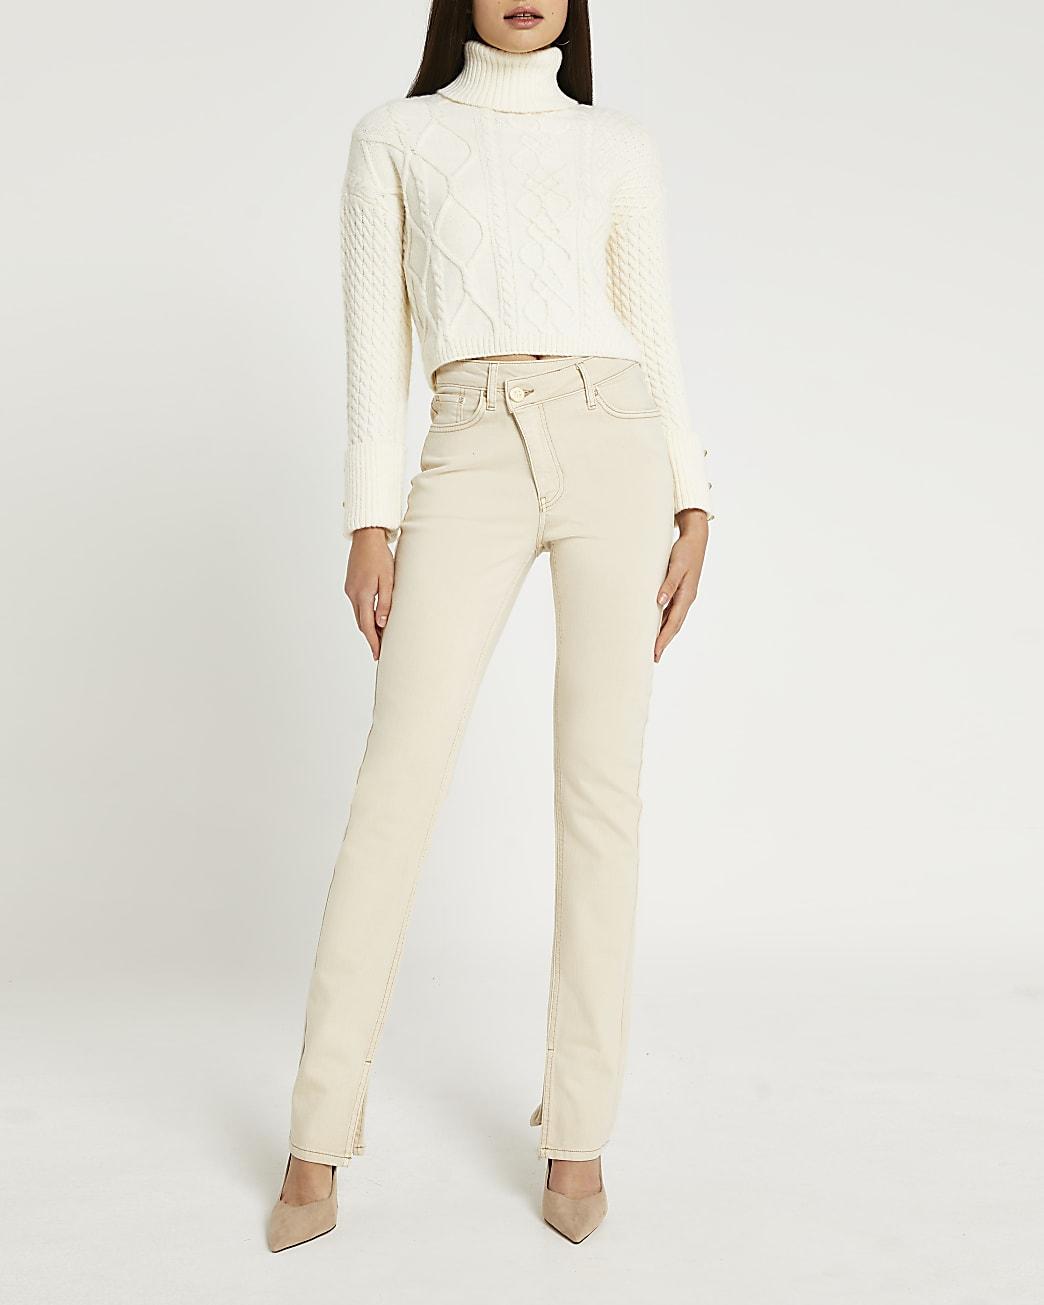 Ecru high waisted straight jeans